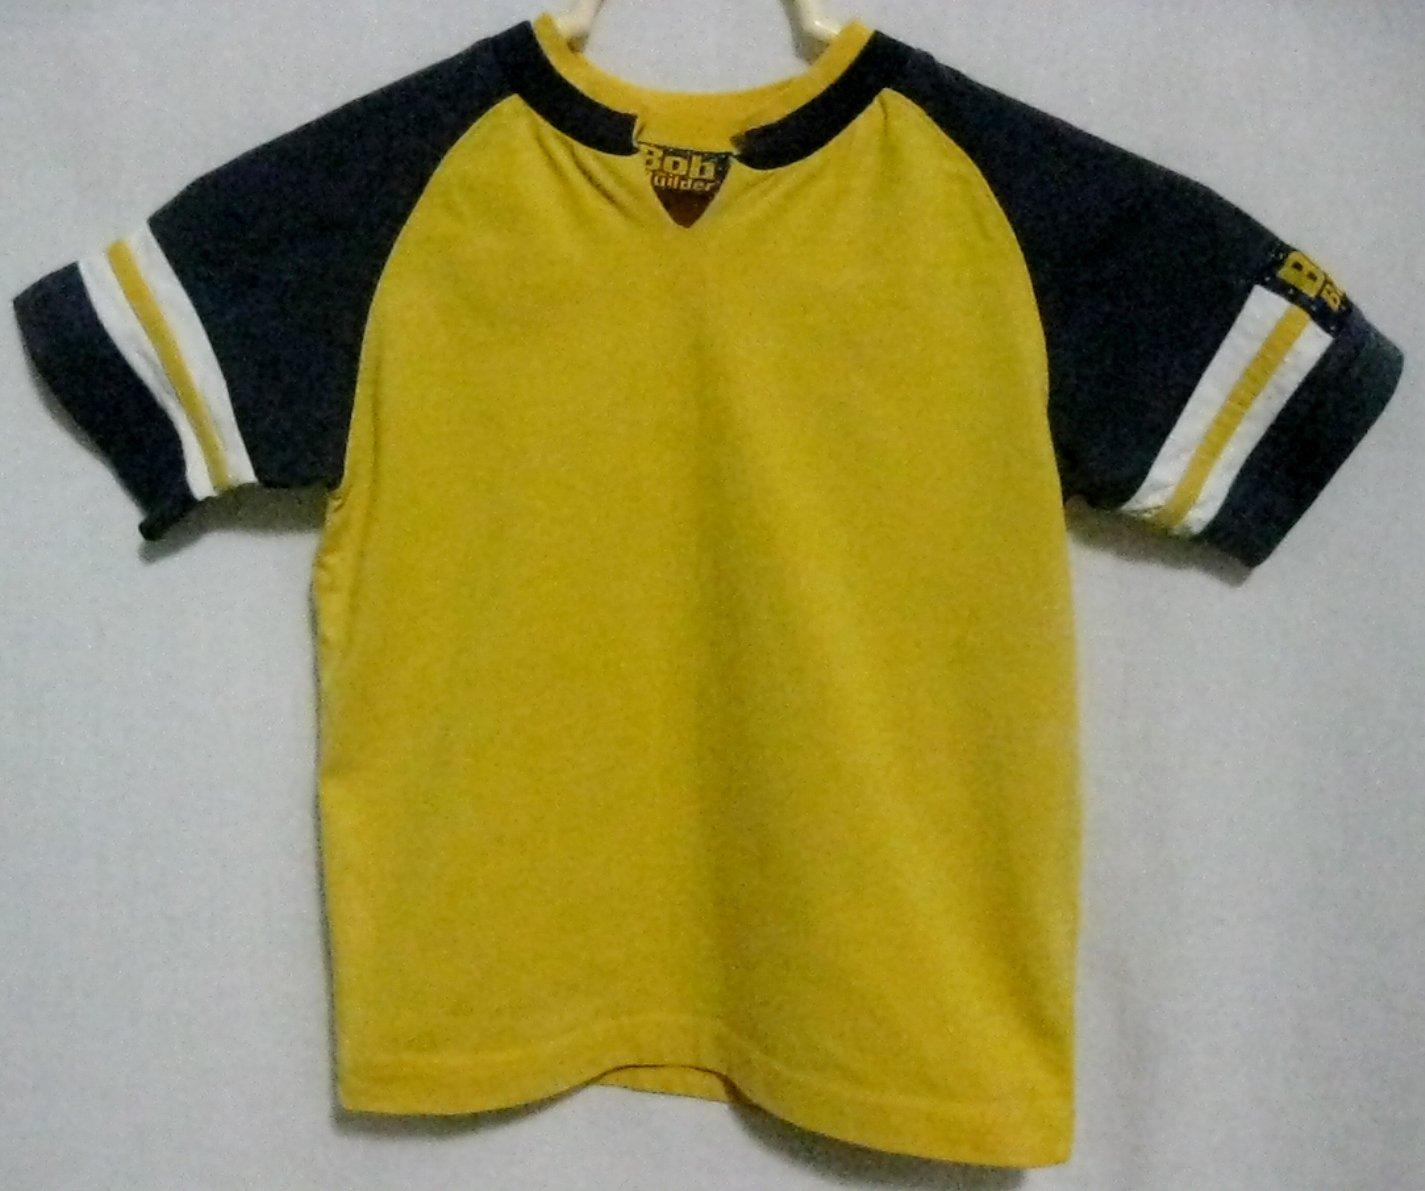 Boy's Bob The Builder Shirt - Size 5T